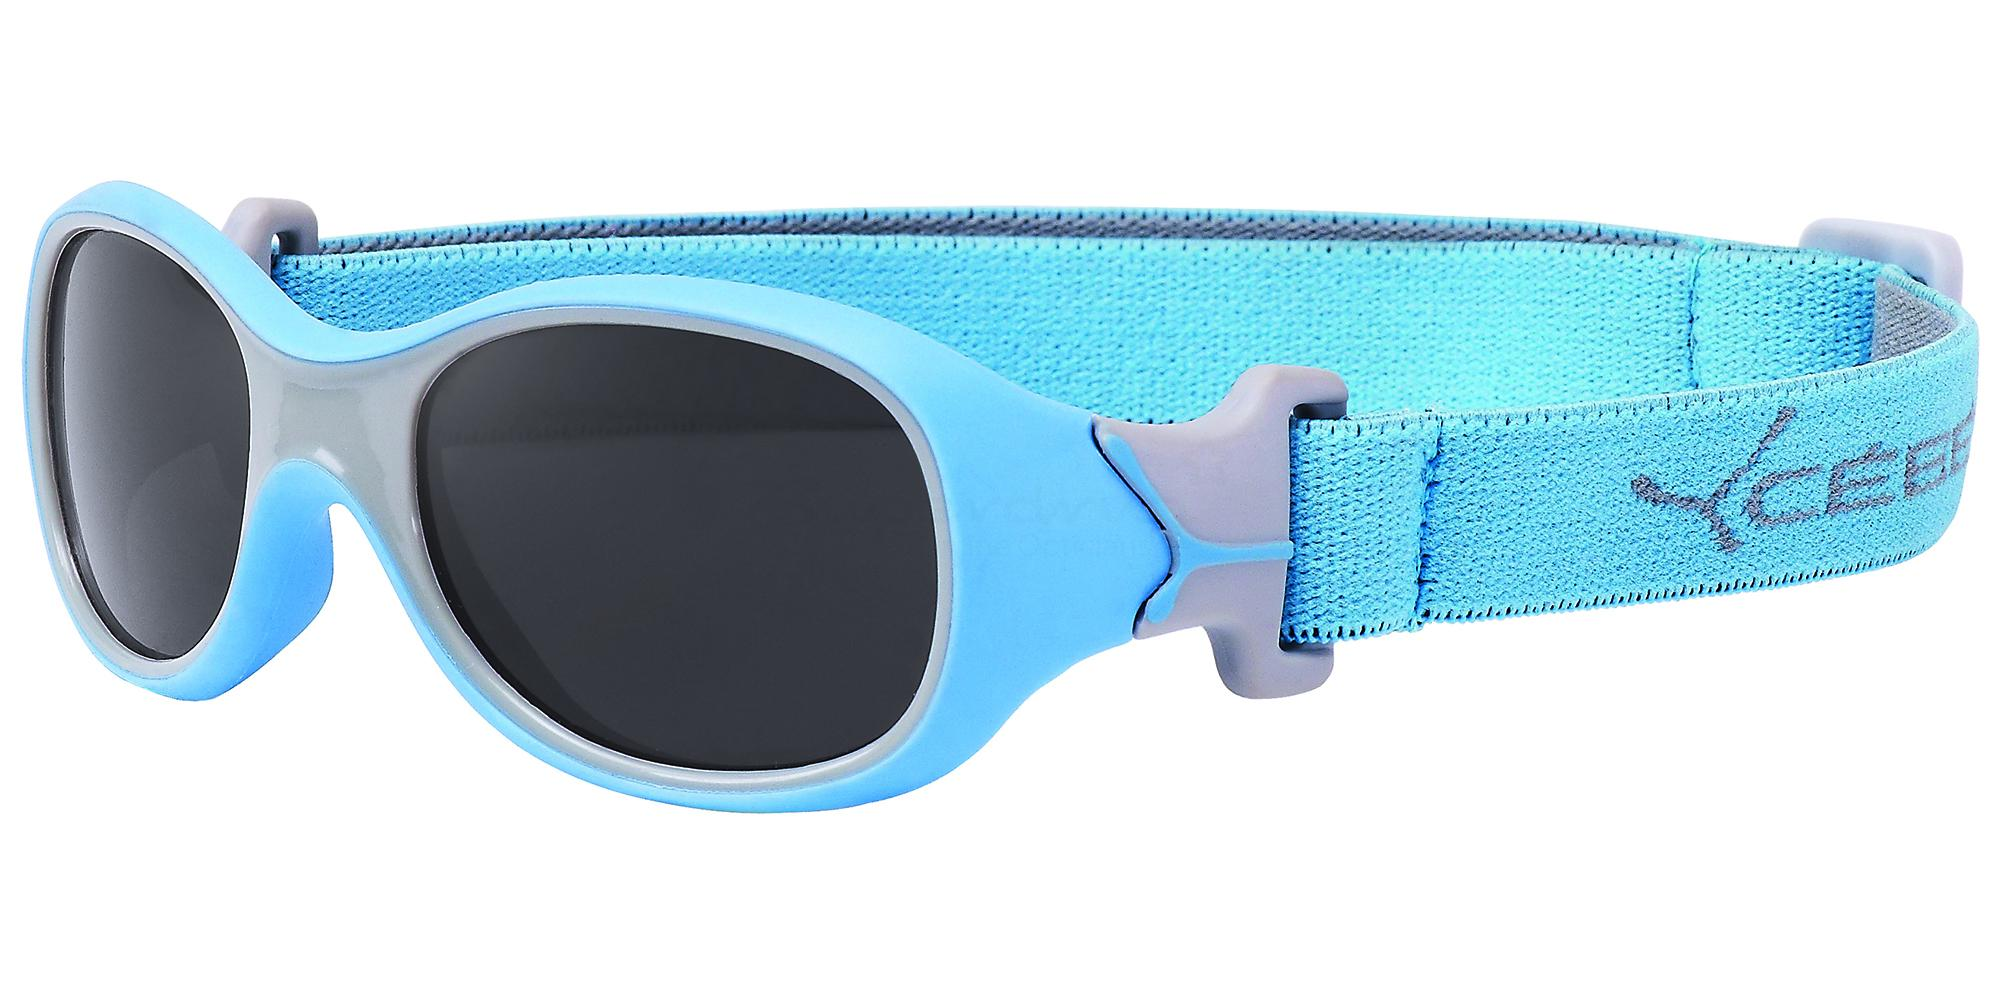 CBCHOU8 Chouka (Age 0-1) Sunglasses, Cebe JUNIOR